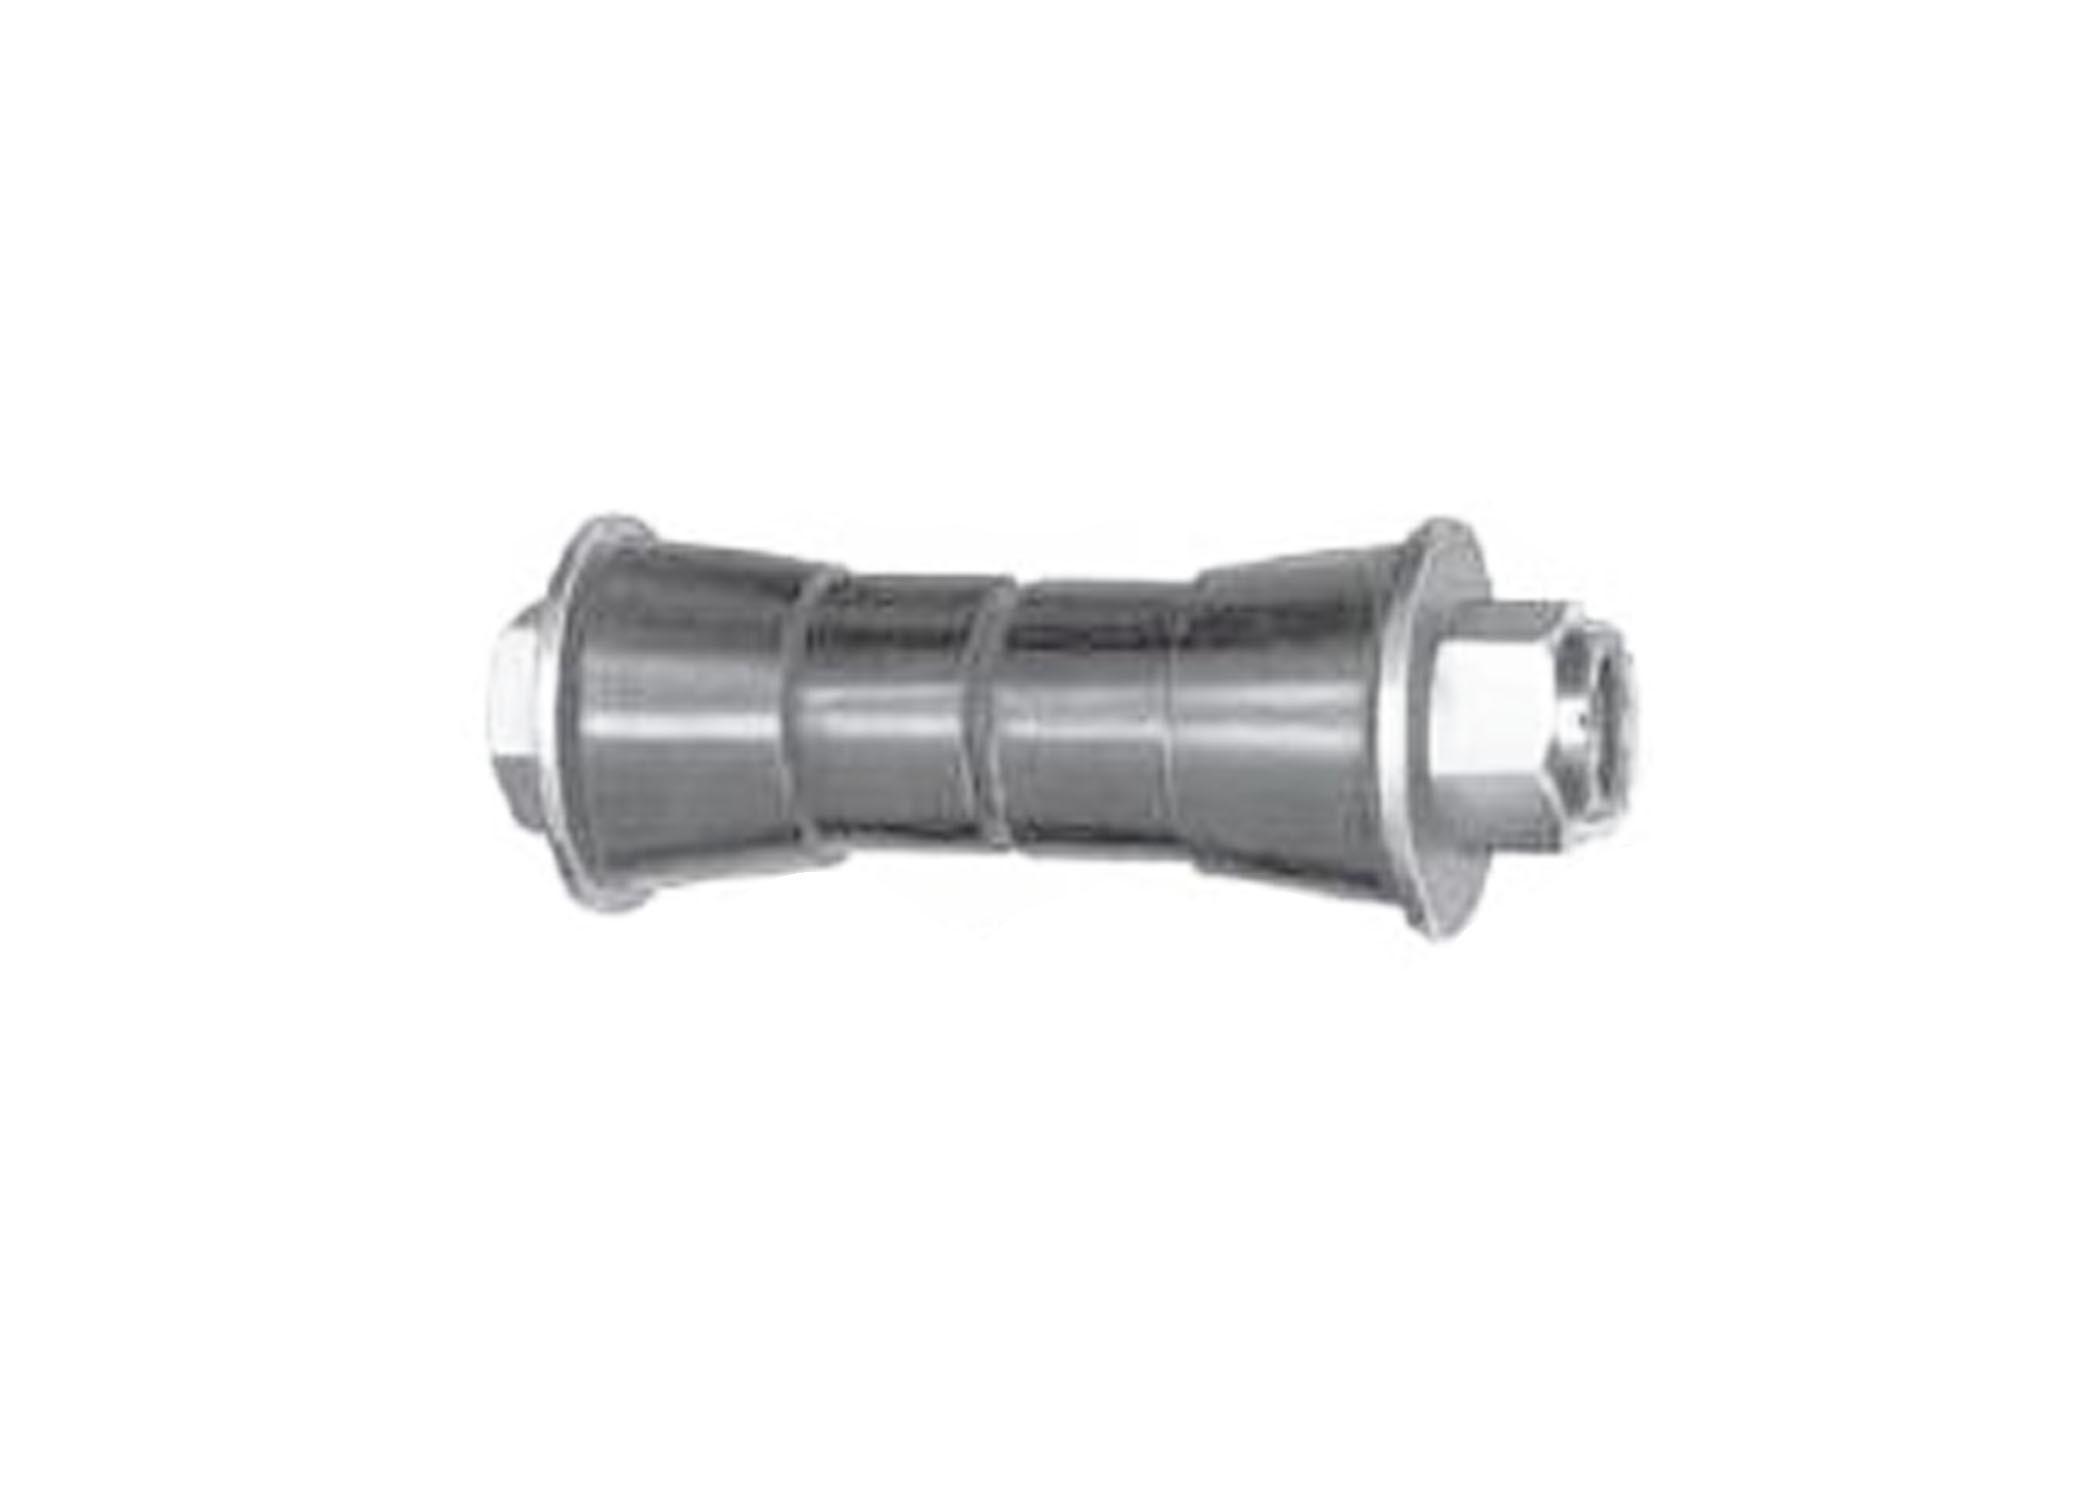 REYCO TORQUE ARM BUSHING ASSEMBLY (MODEL 21B) - Suspension Parts